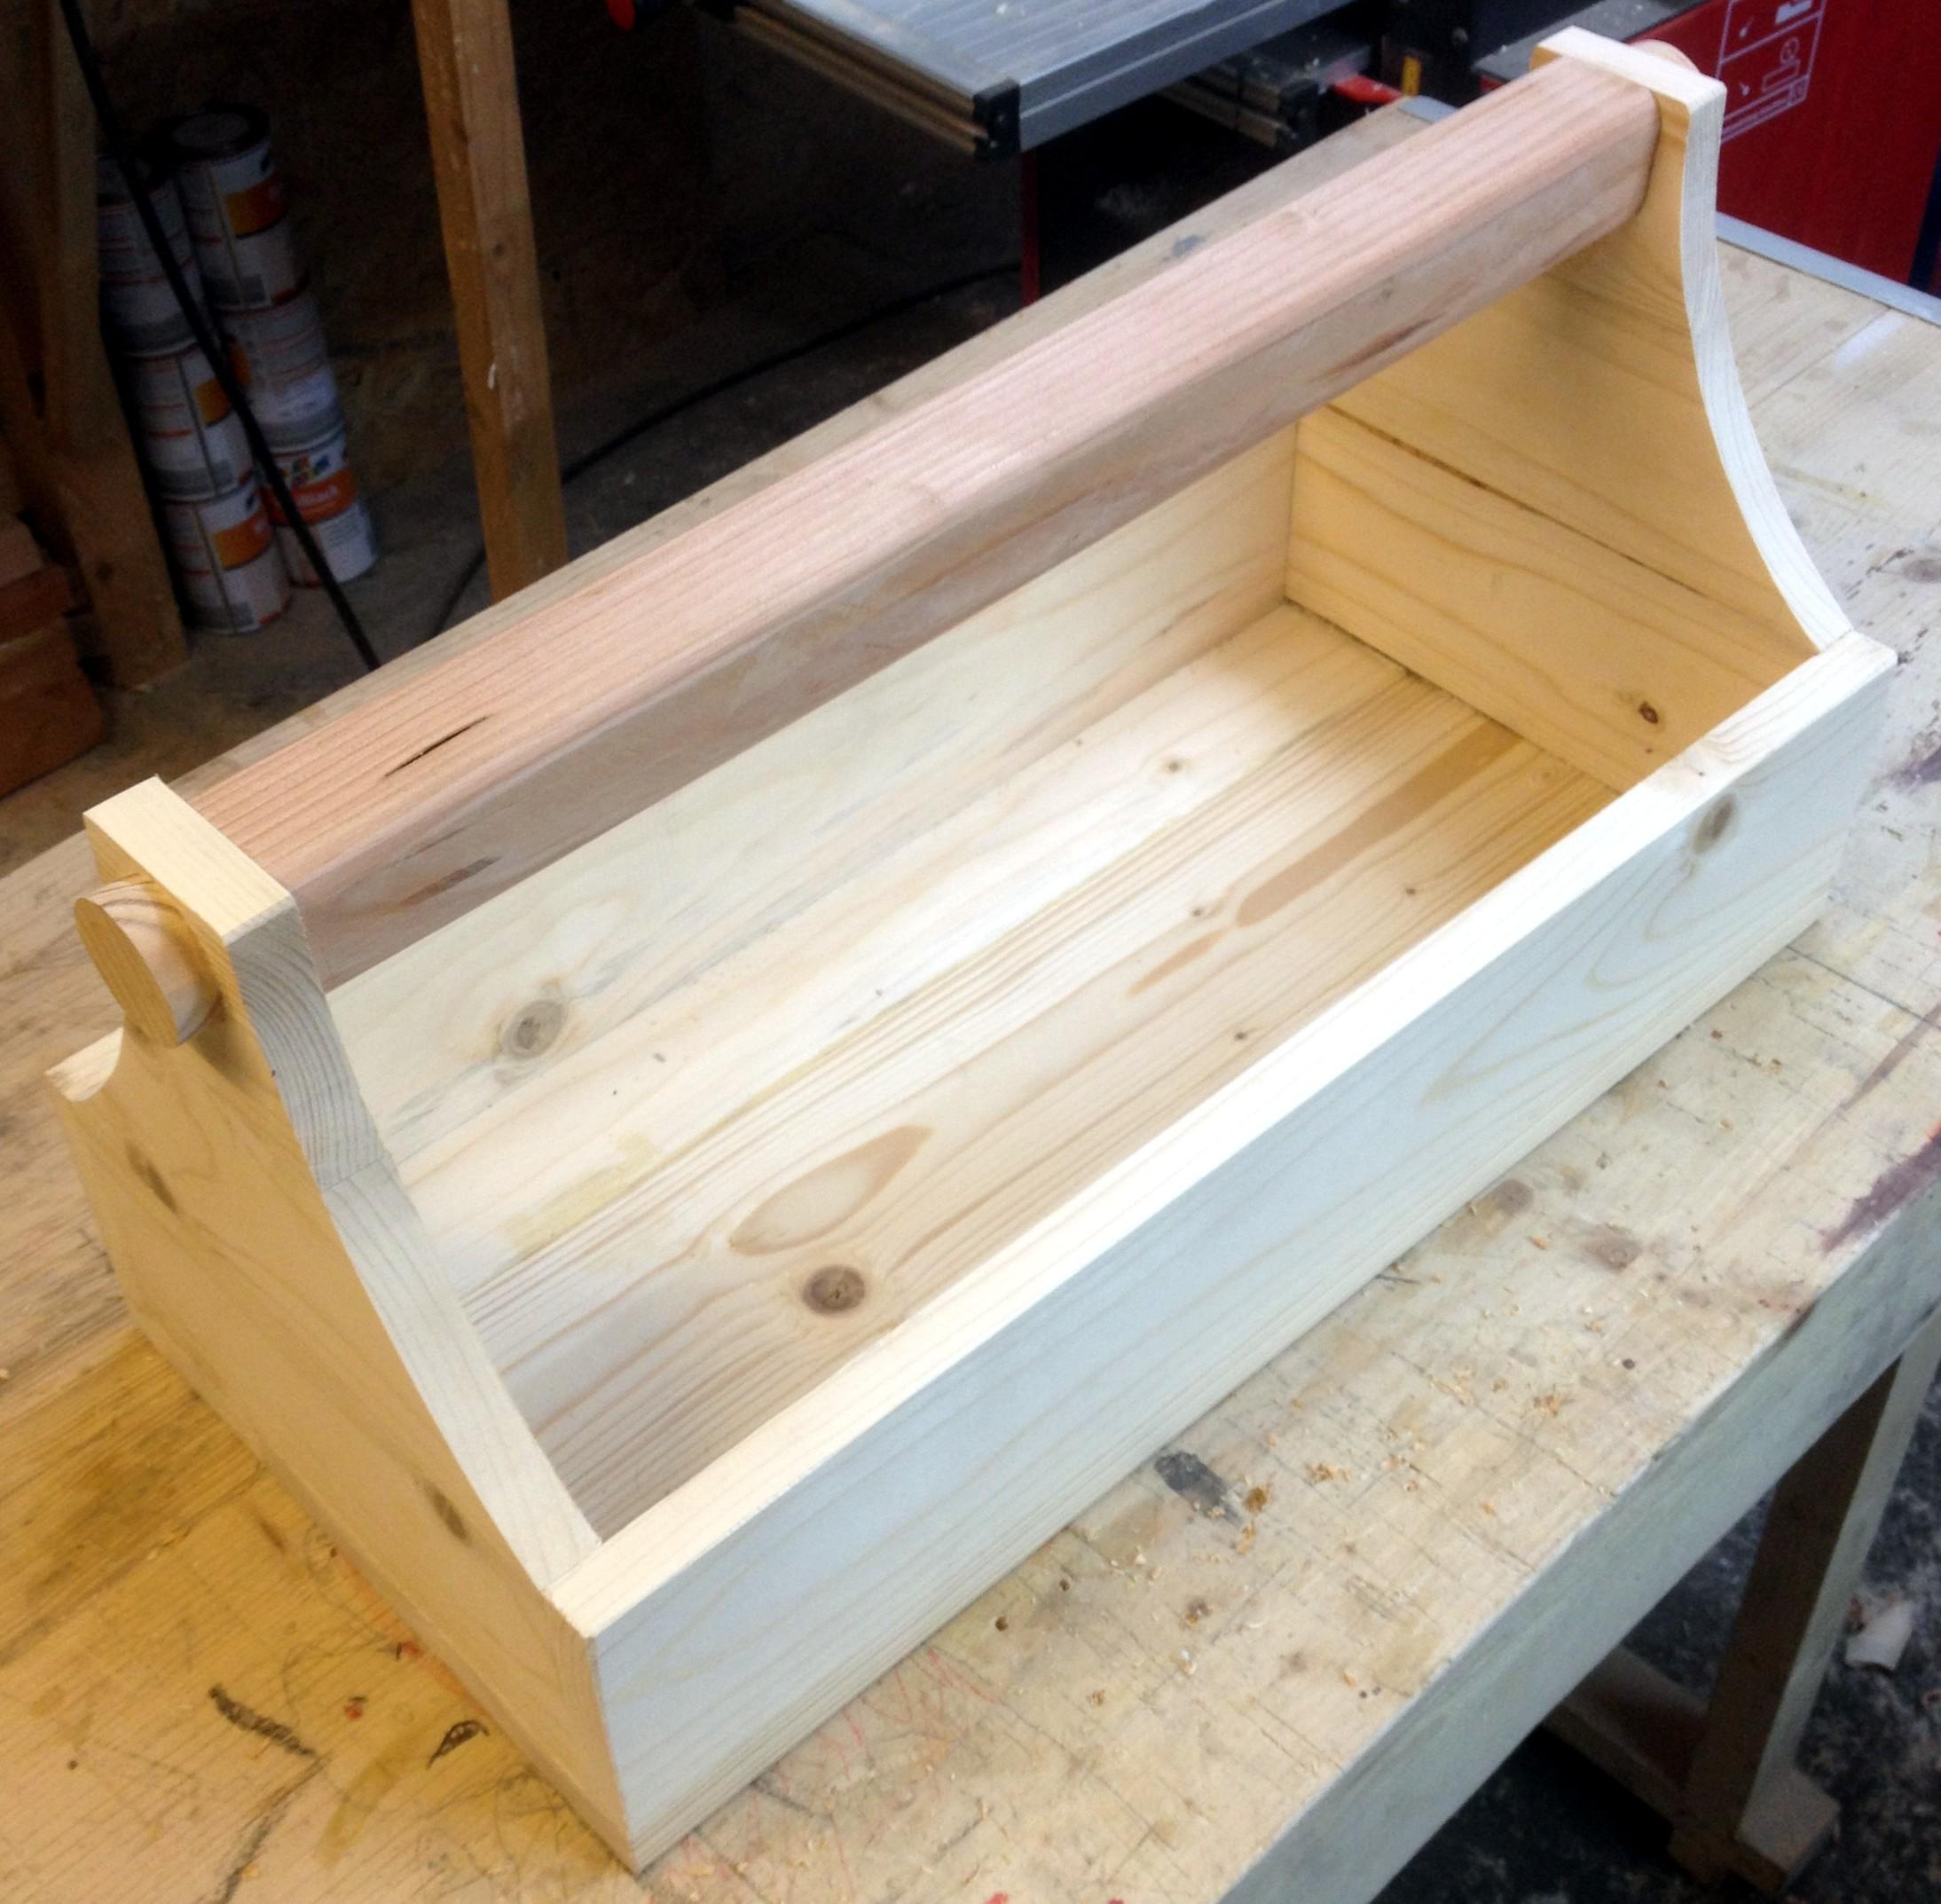 werkzeugbox selbst gebaut der kellerwerker. Black Bedroom Furniture Sets. Home Design Ideas